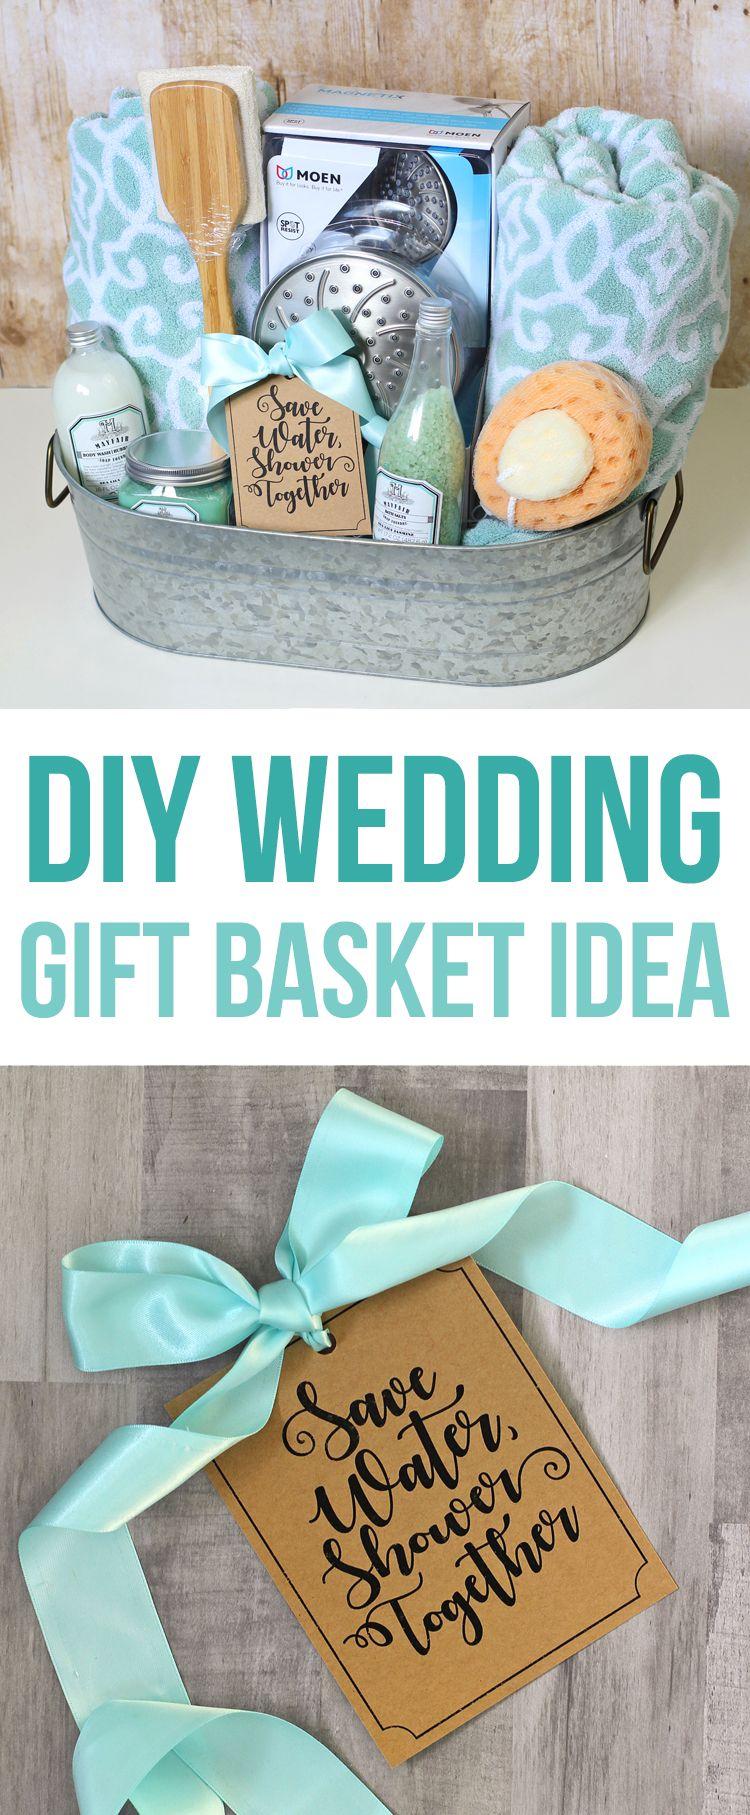 Shower Themed Diy Wedding Gift Basket Idea Wedding Gift